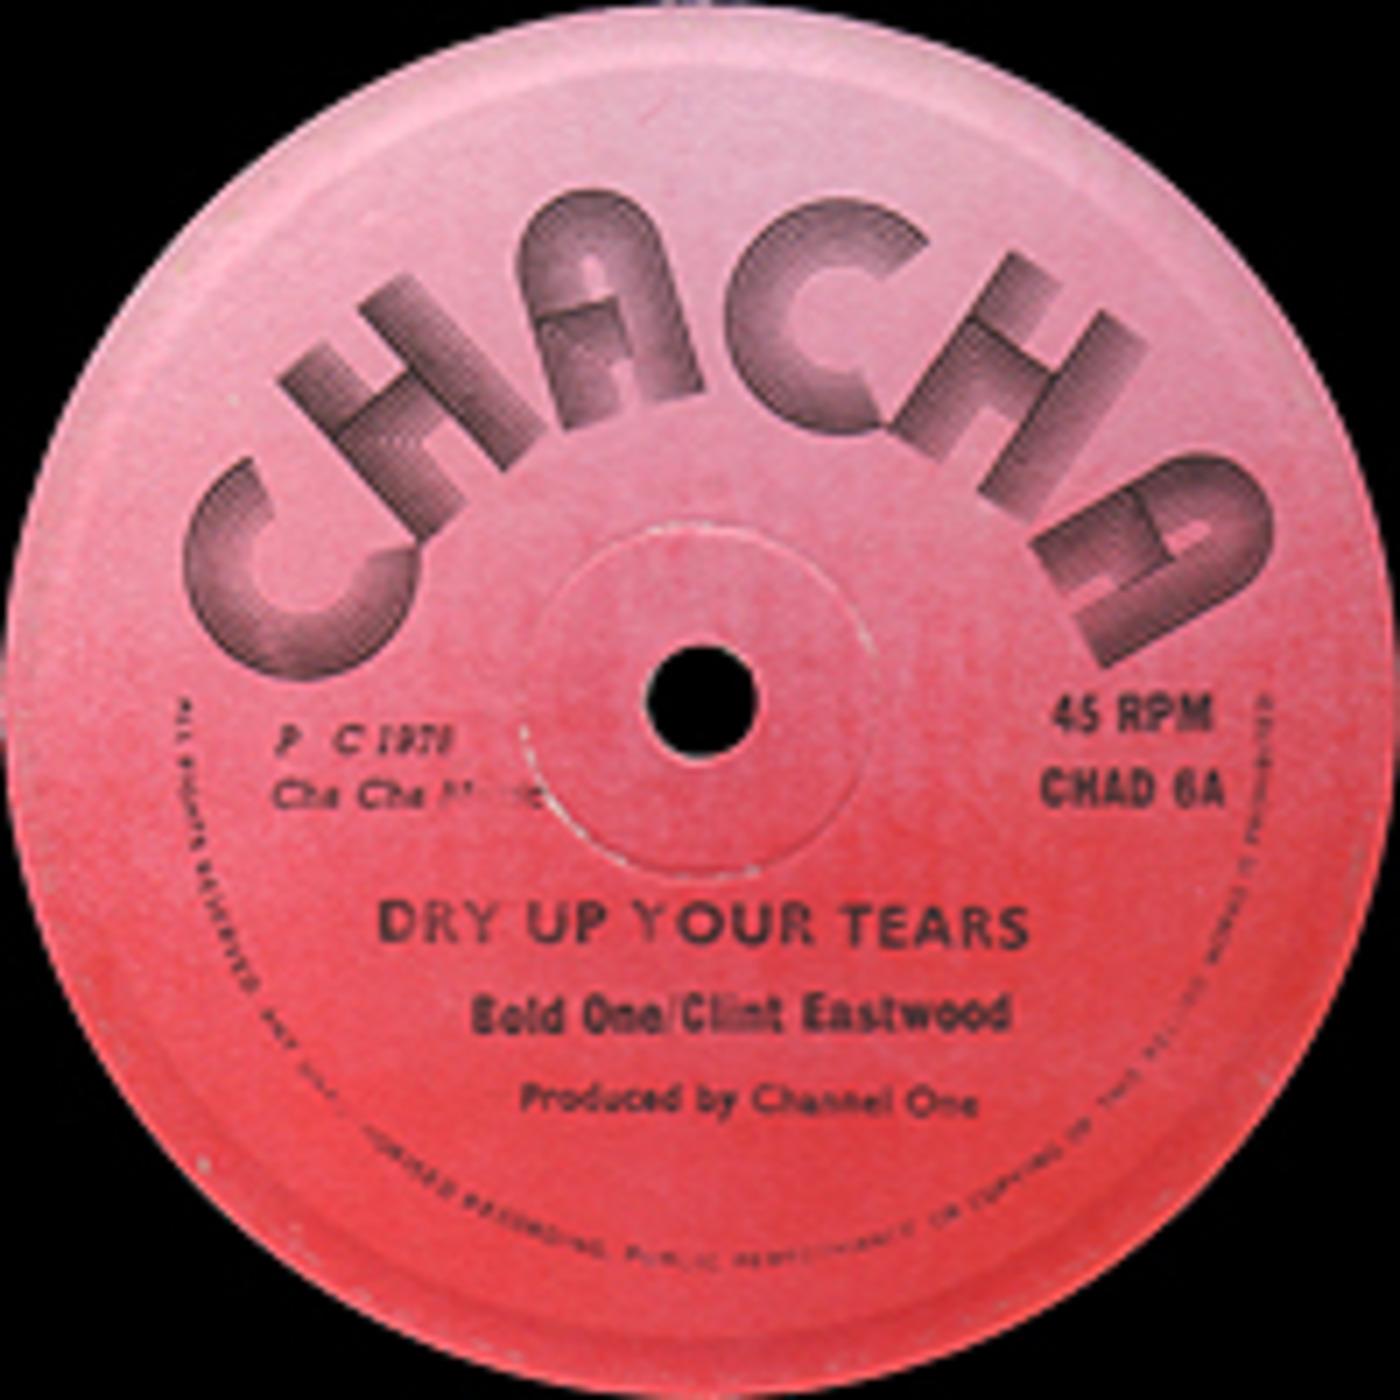 Don Evans & Paragons, The / Soul Vendors, The* Soul Vendors - Danger In Your Eyes